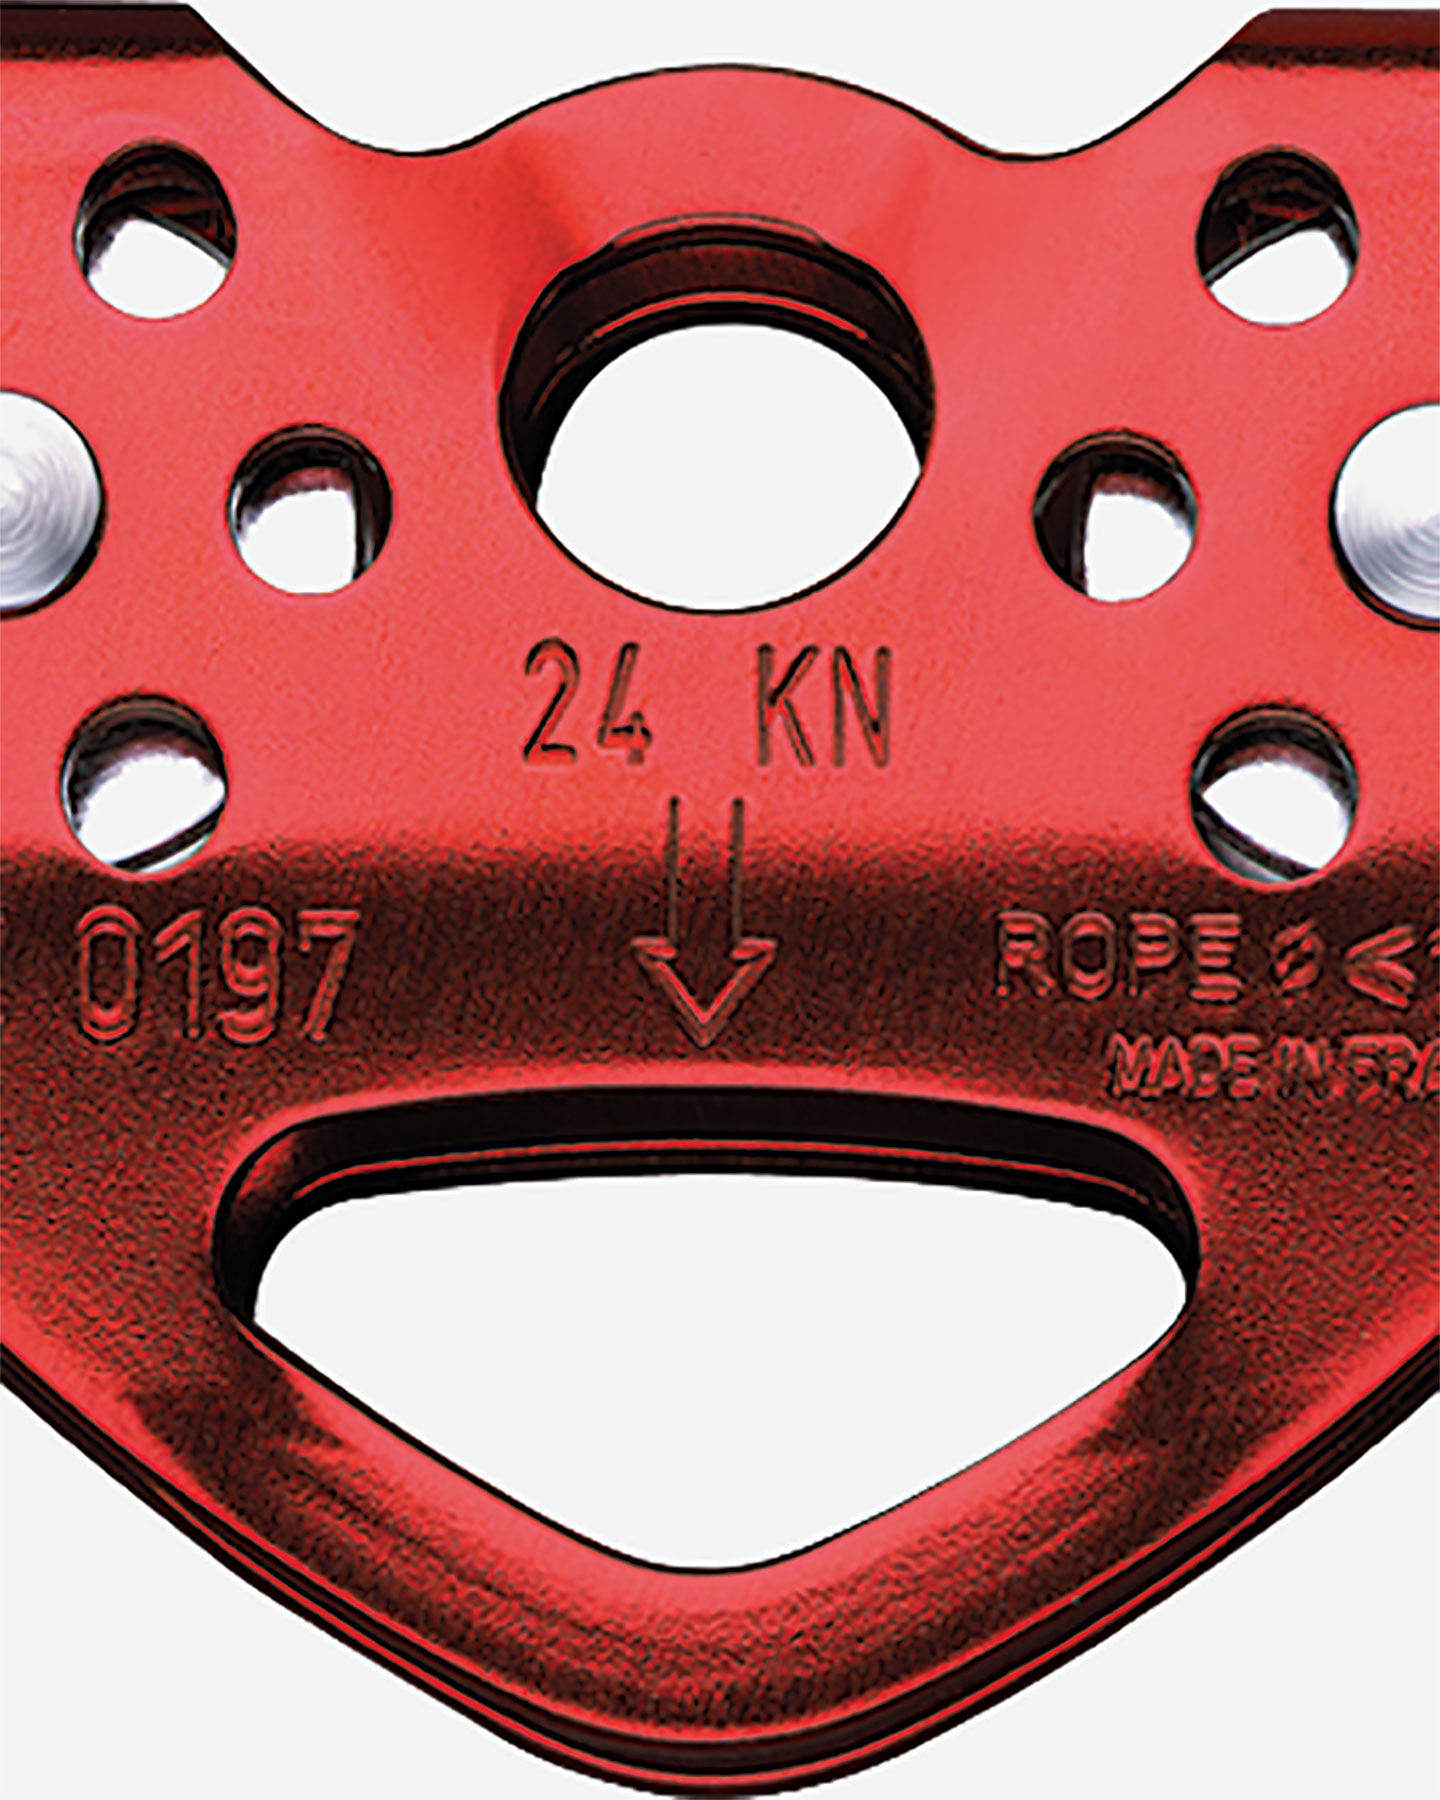 Accessorio arrampicata PETZL CARRUCOLA PETZL TANDEM P21 S0060253|9999|UNI scatto 1